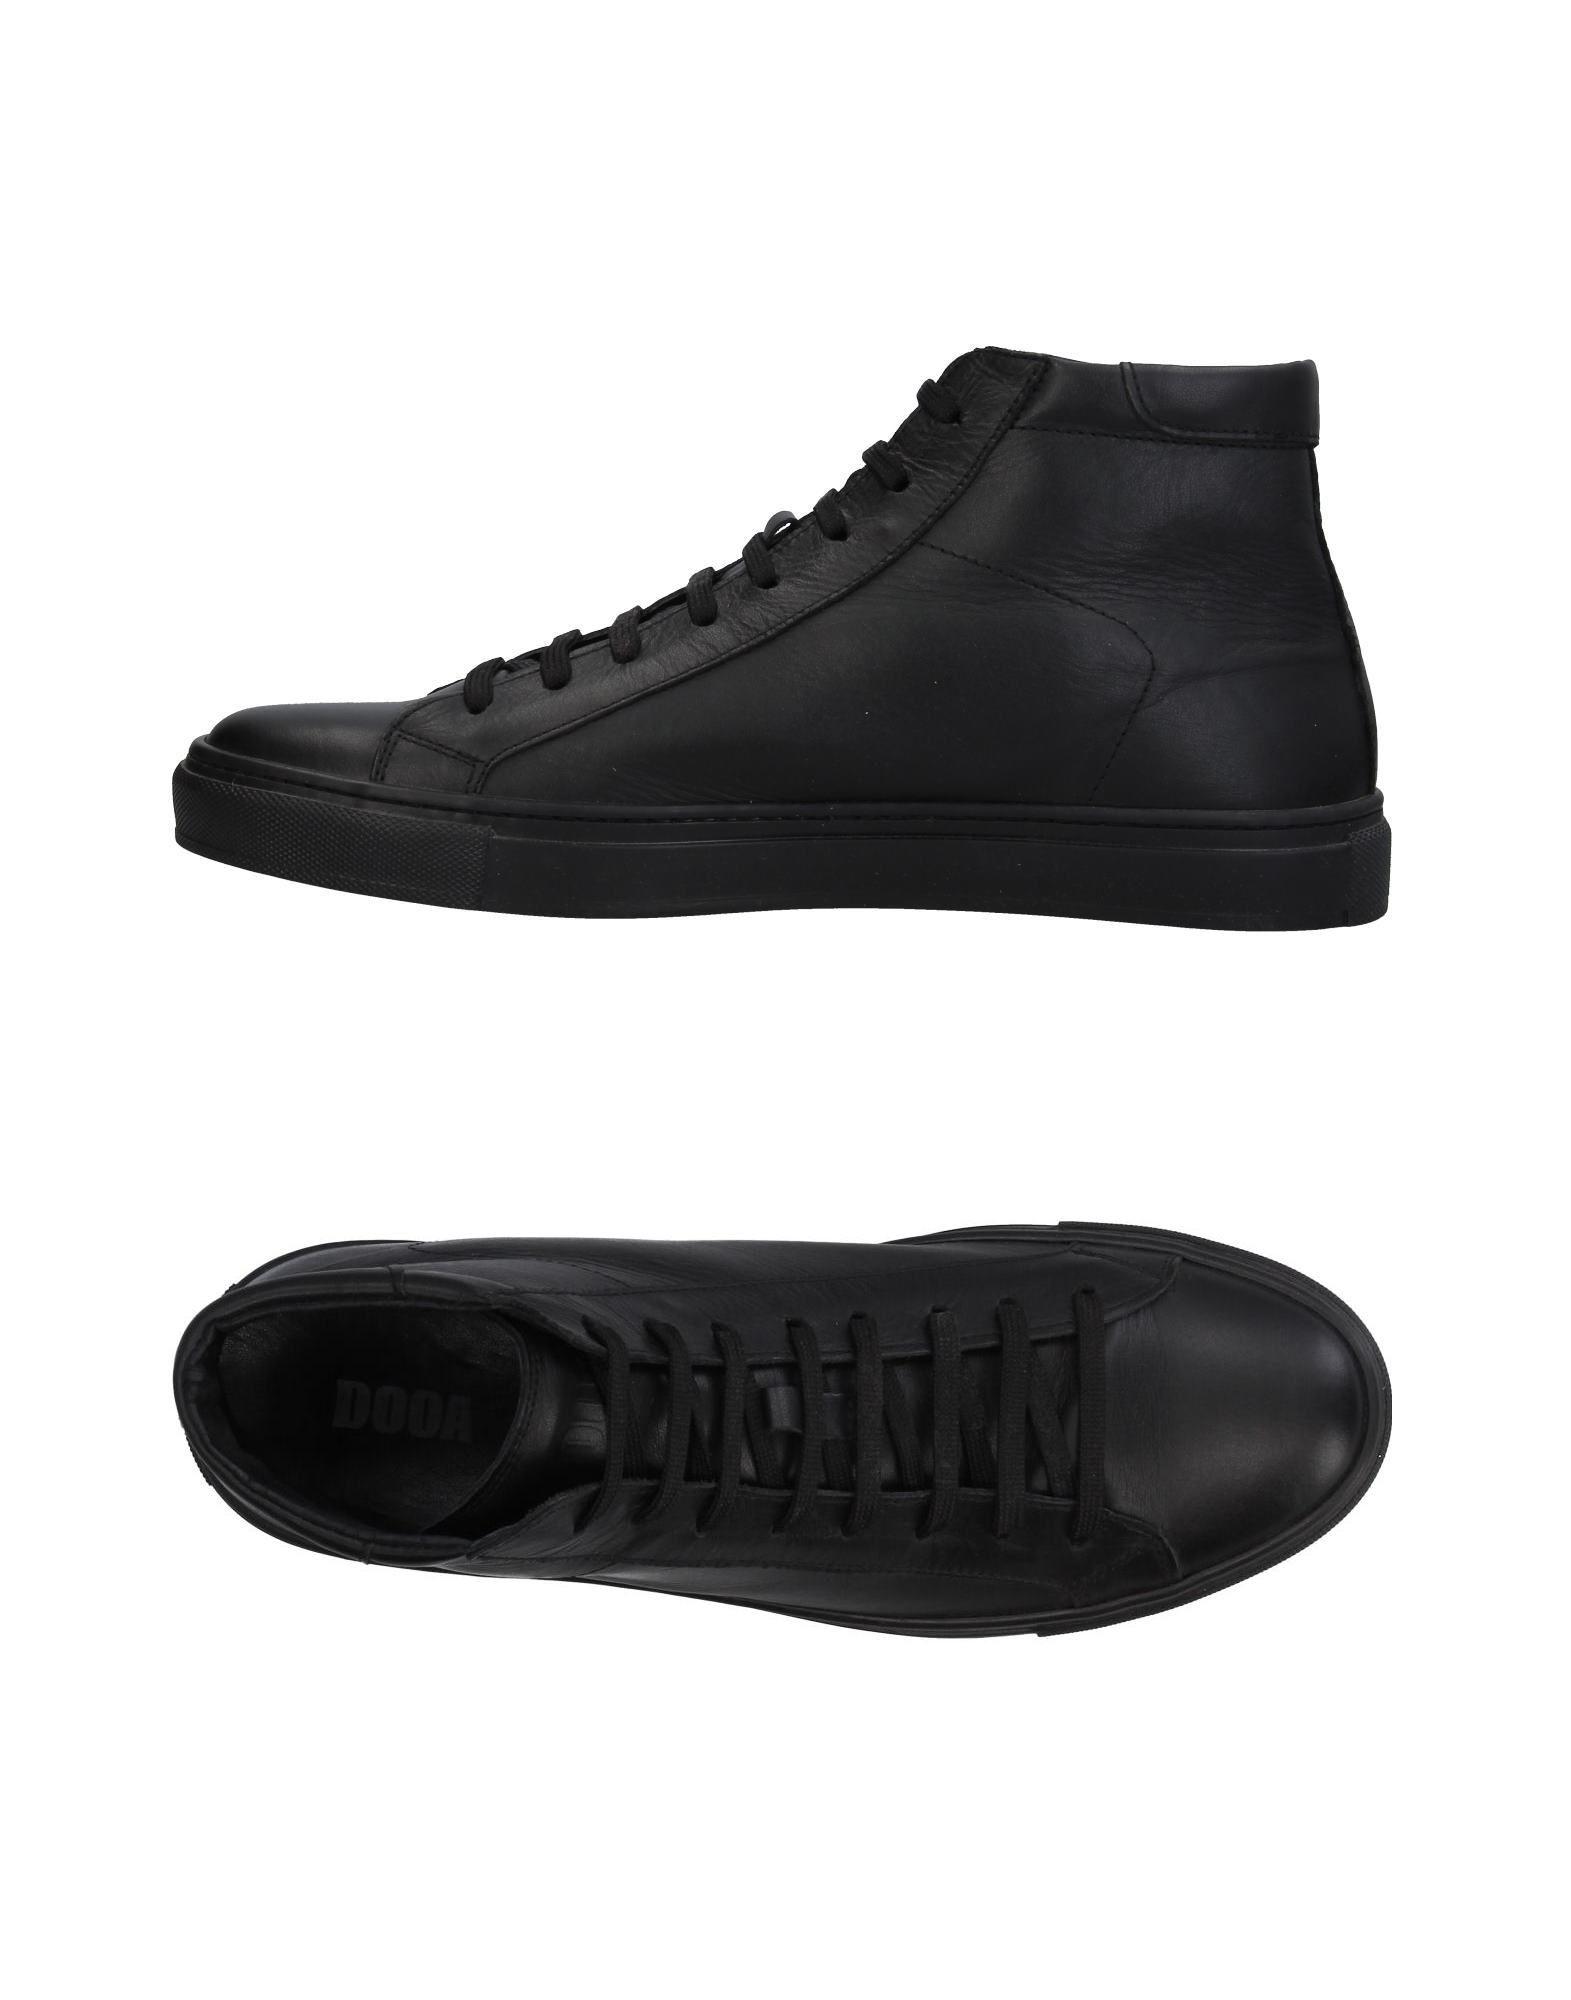 DOOA Высокие кеды и кроссовки кеды кроссовки высокие dc council mid tx stone camo